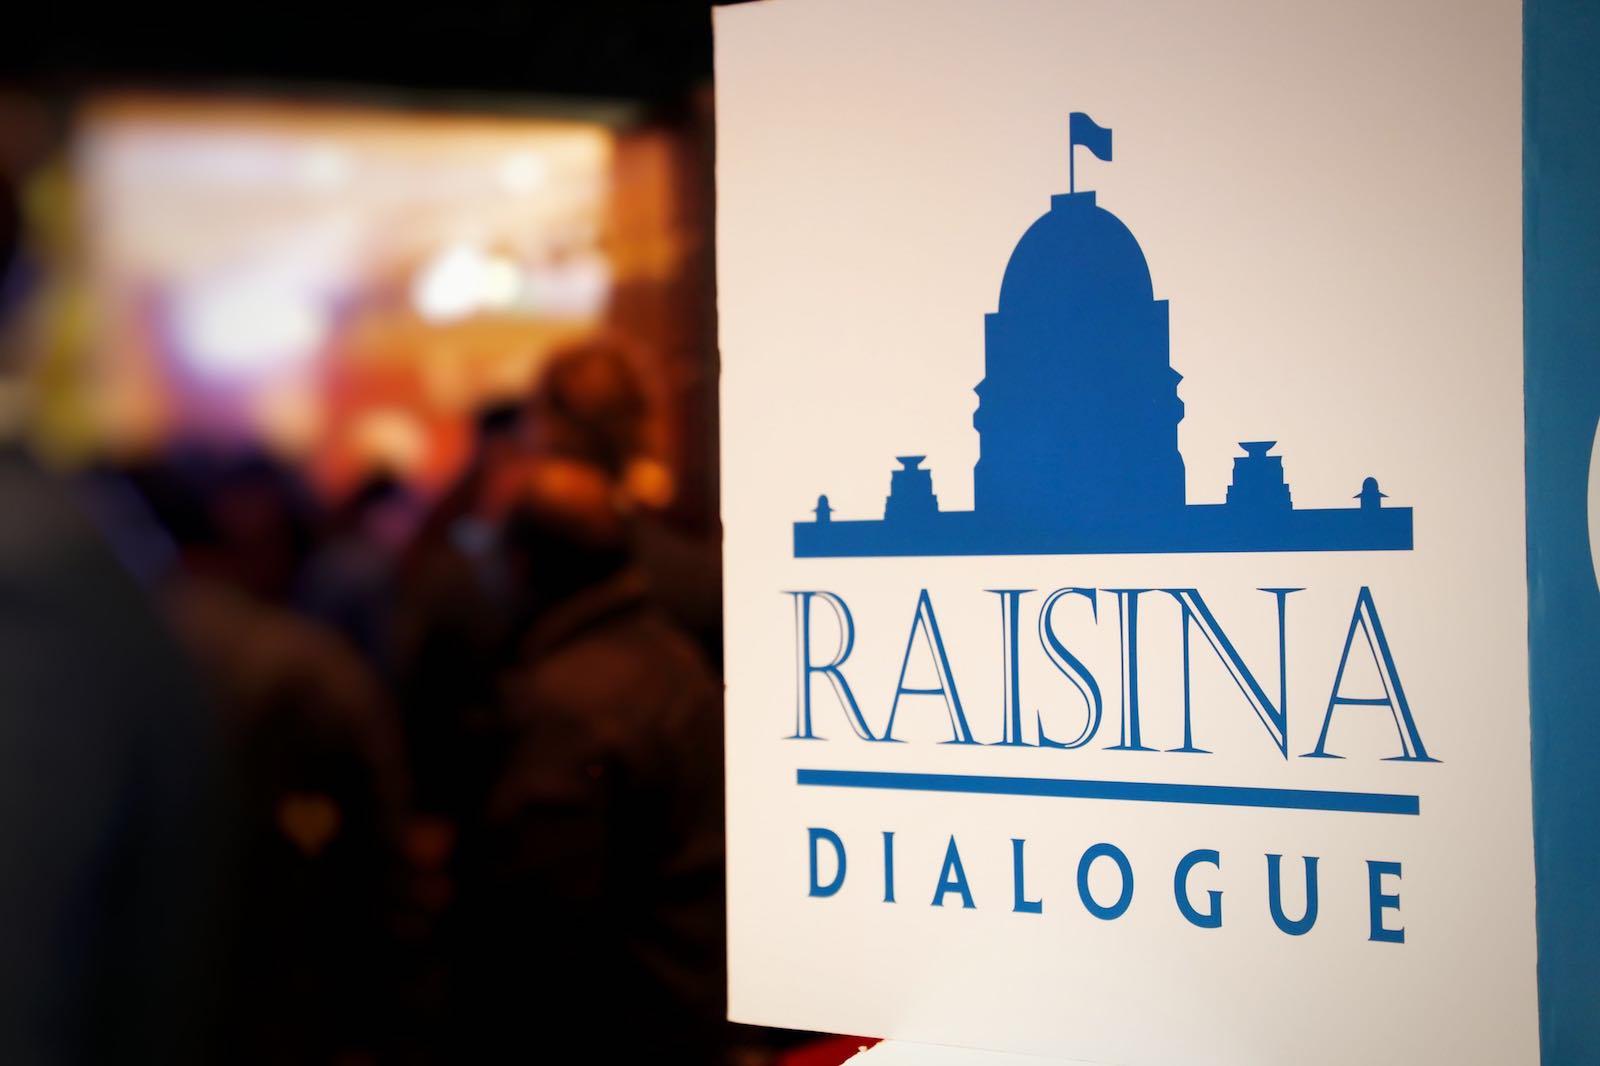 Scott Morrison wasn't at the Raisina Dialogue, but his ideas were